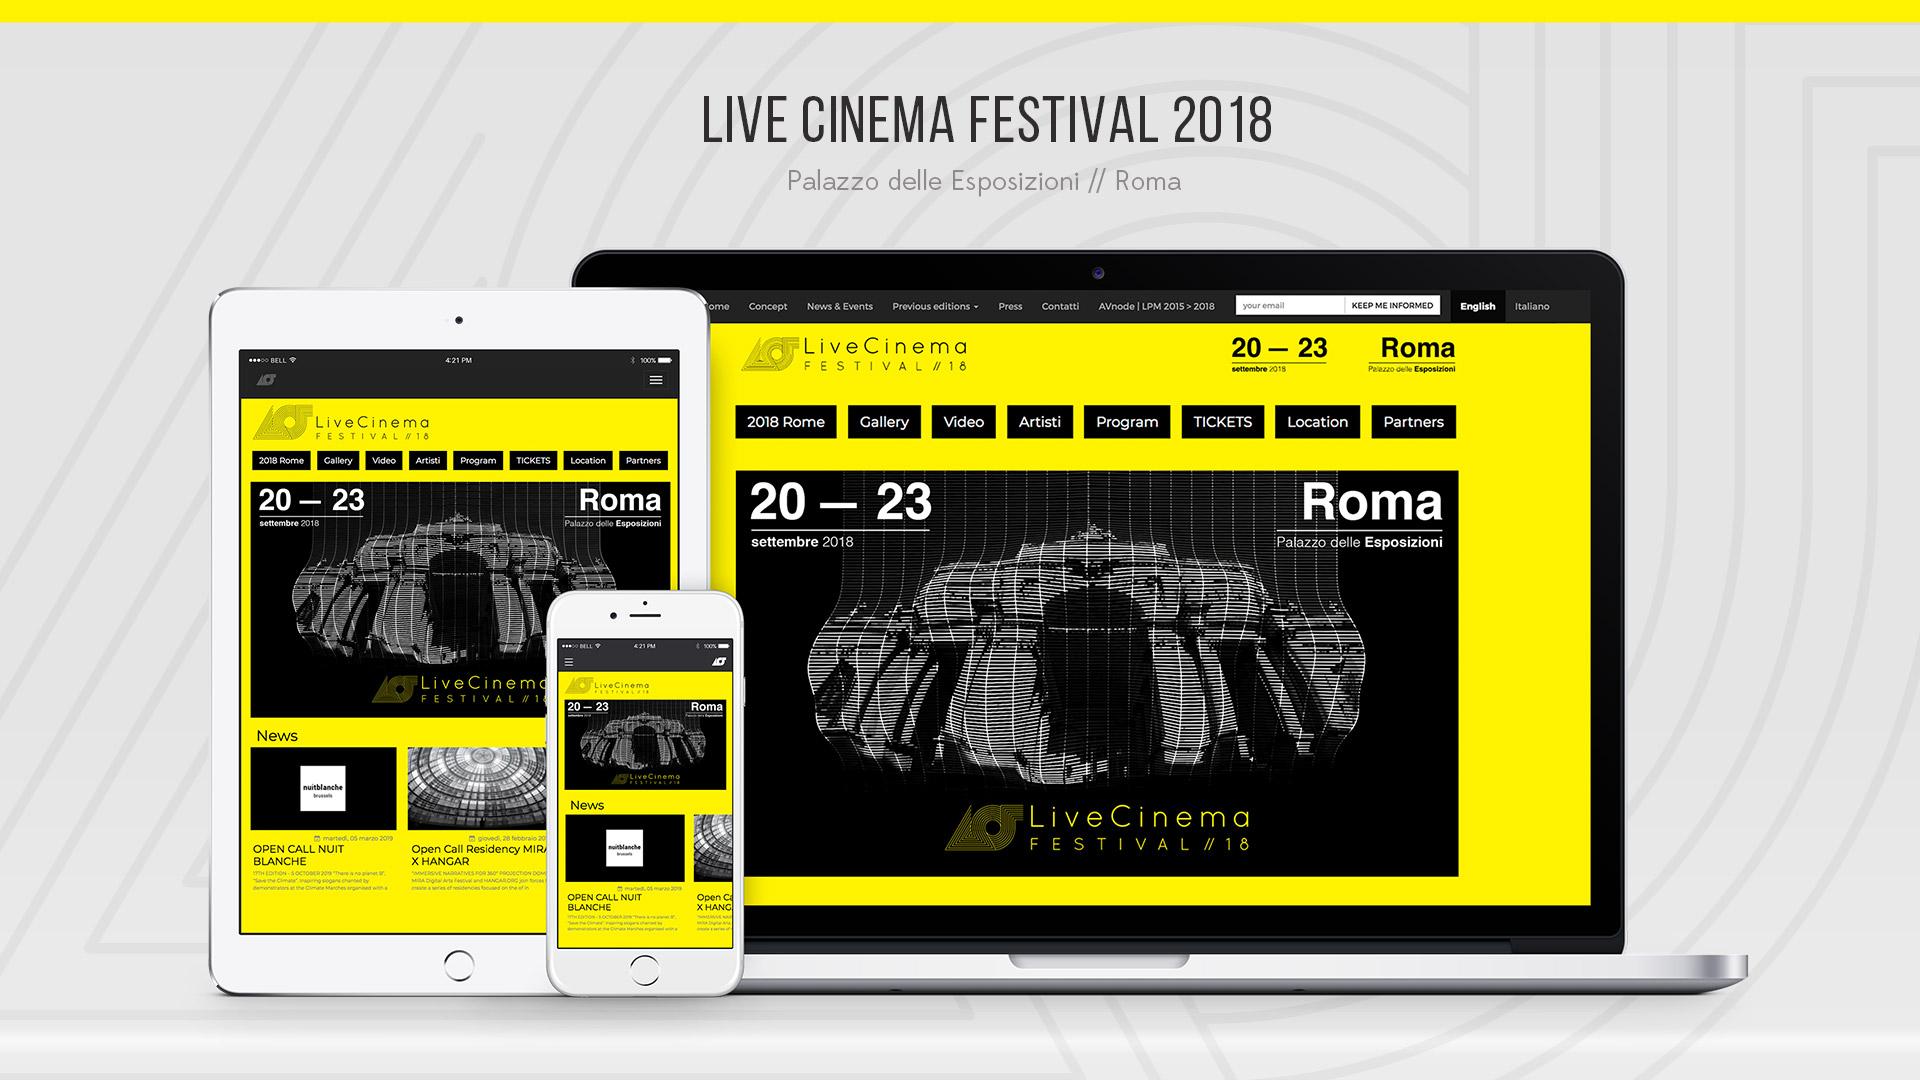 Live Cinema Festival 2018 – Web Site